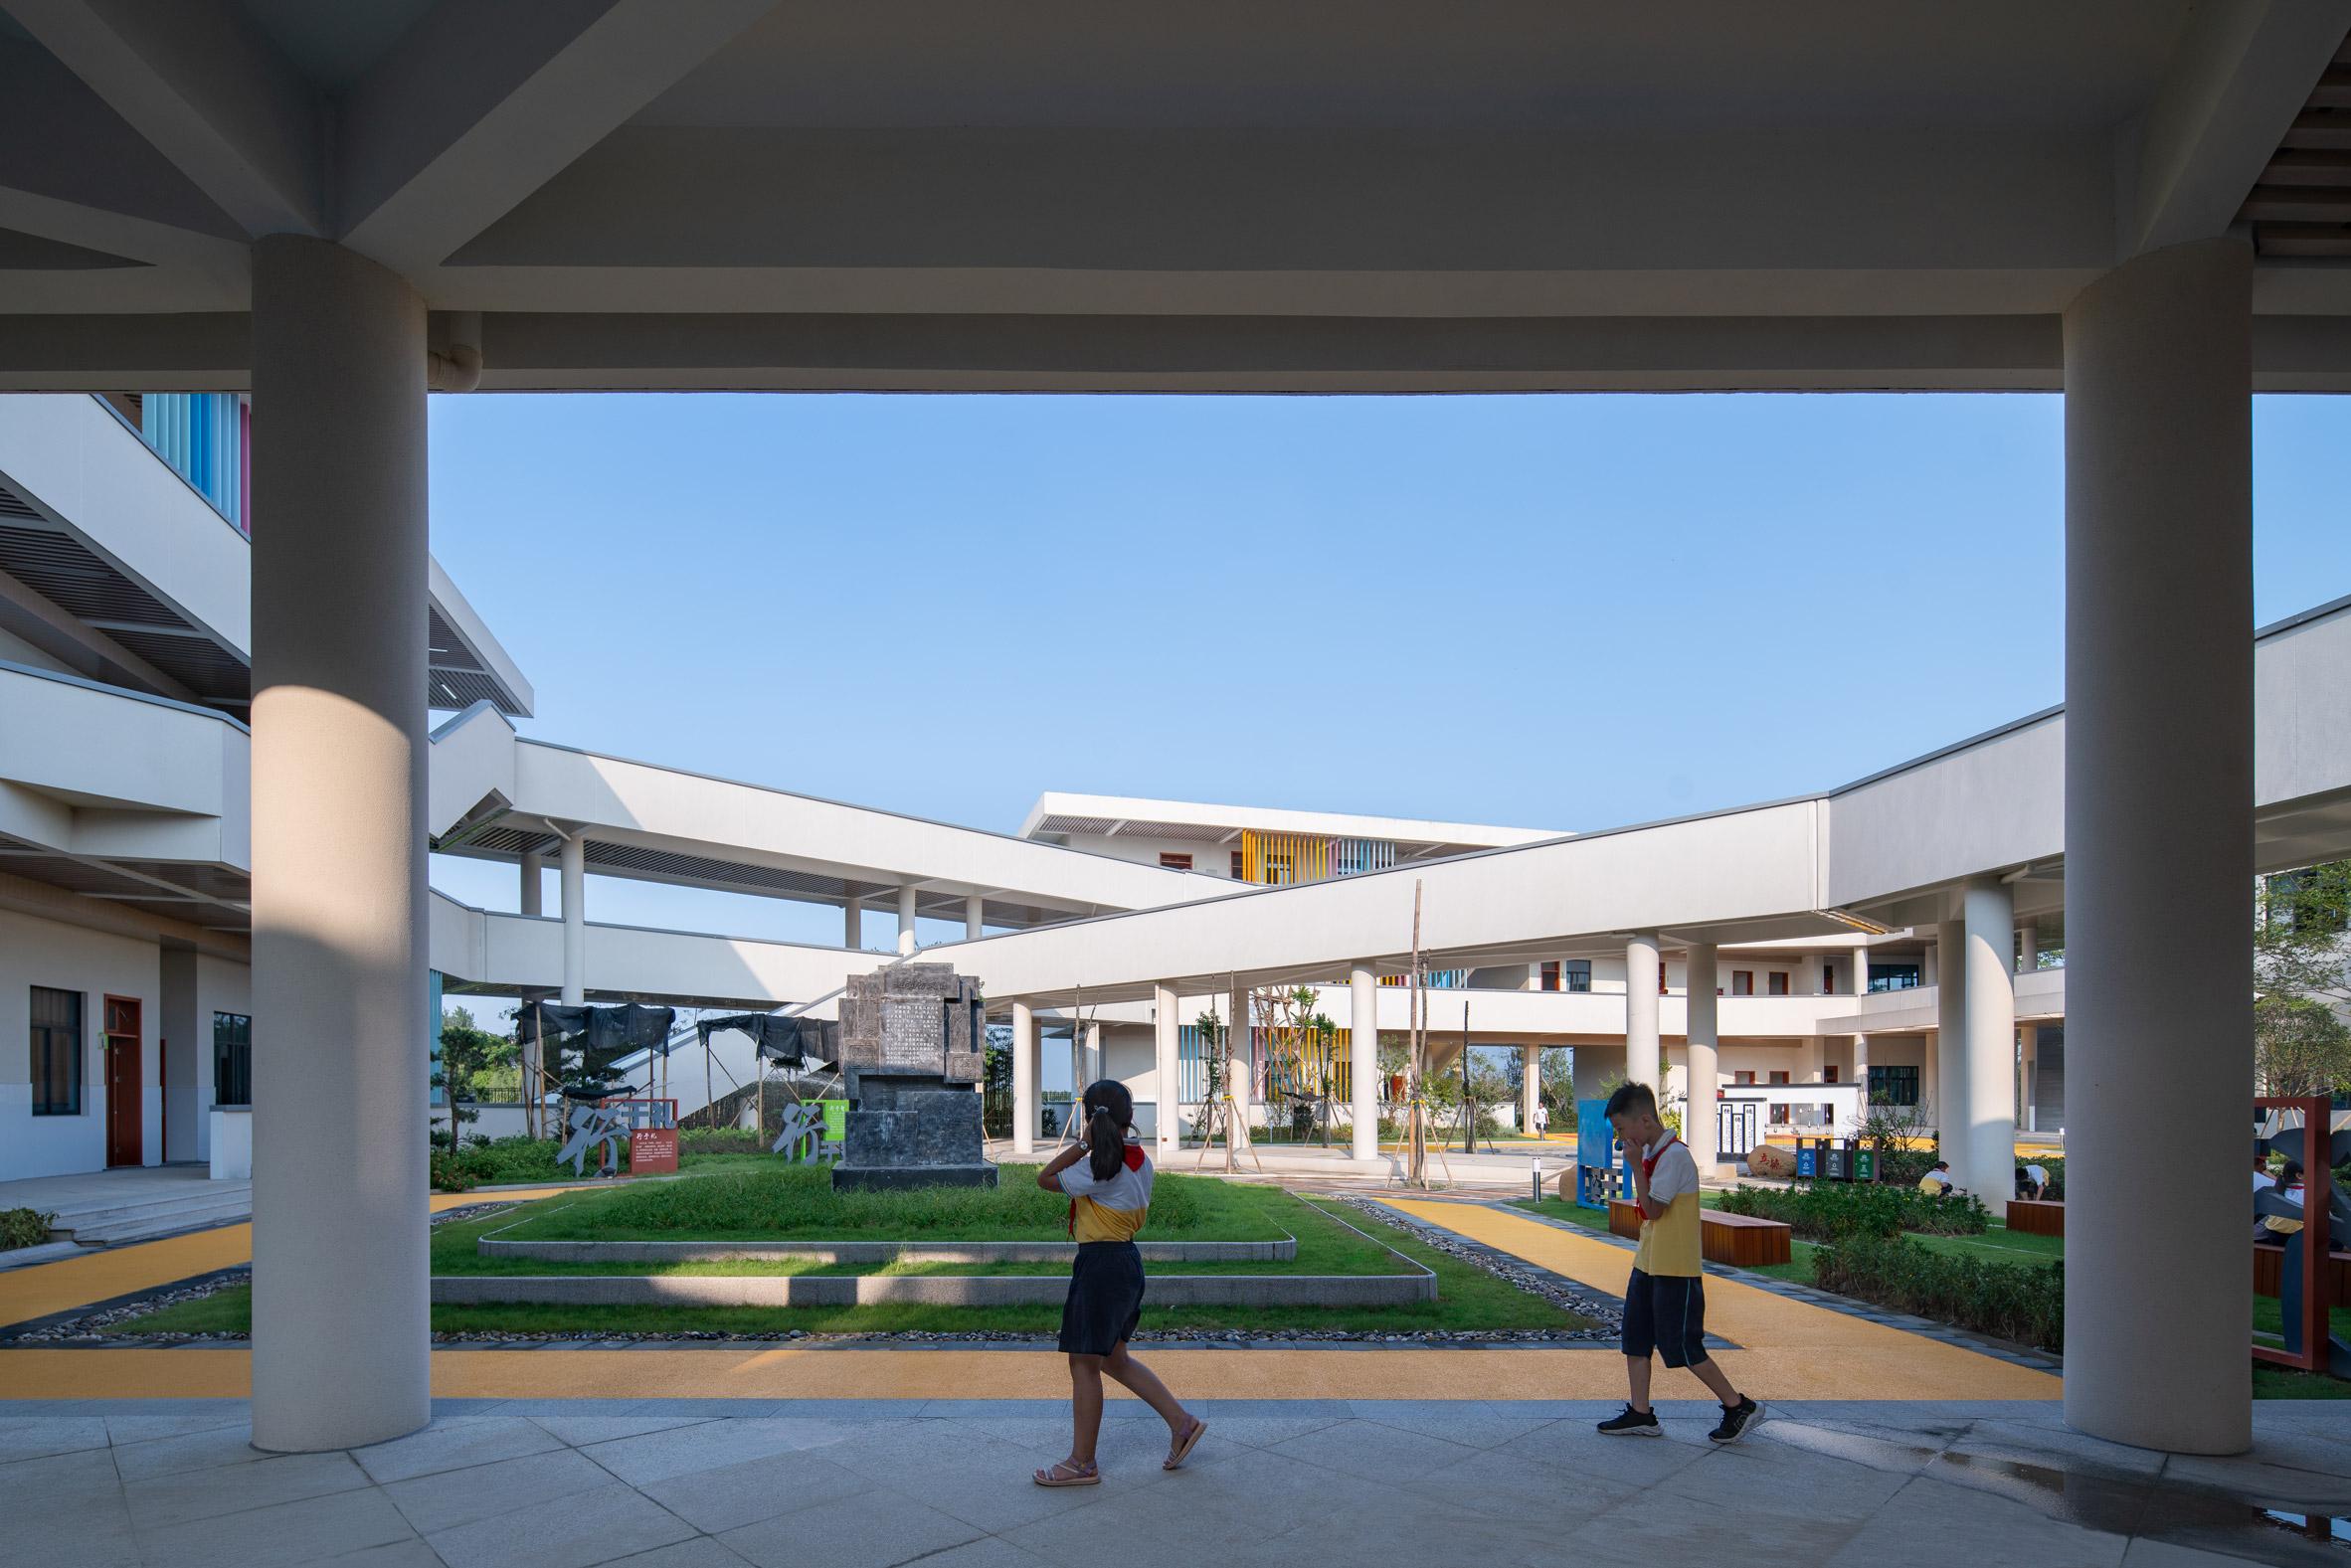 Ground floor walkways in Chinese primary school